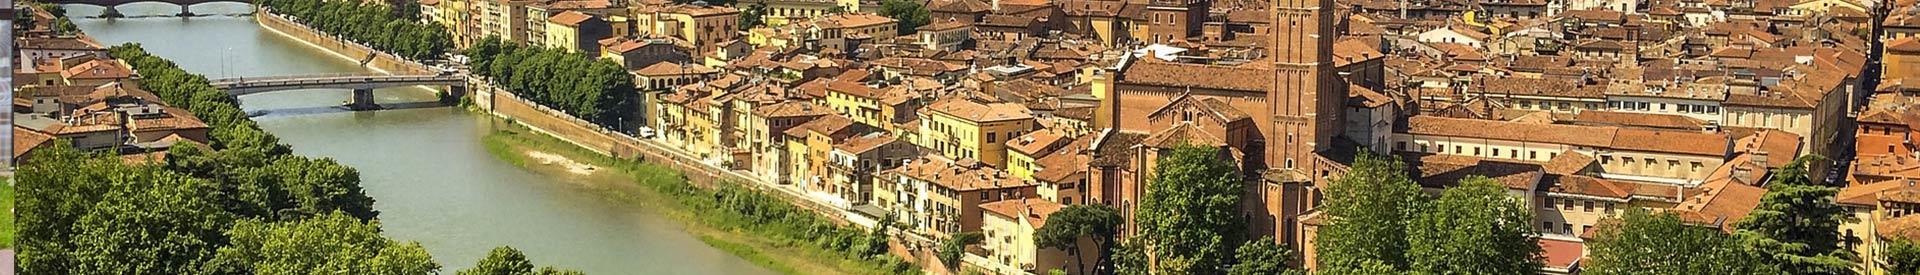 Verona centro storico best western hotel turismo hotel - Mondocasashop san martino buon albergo vr ...